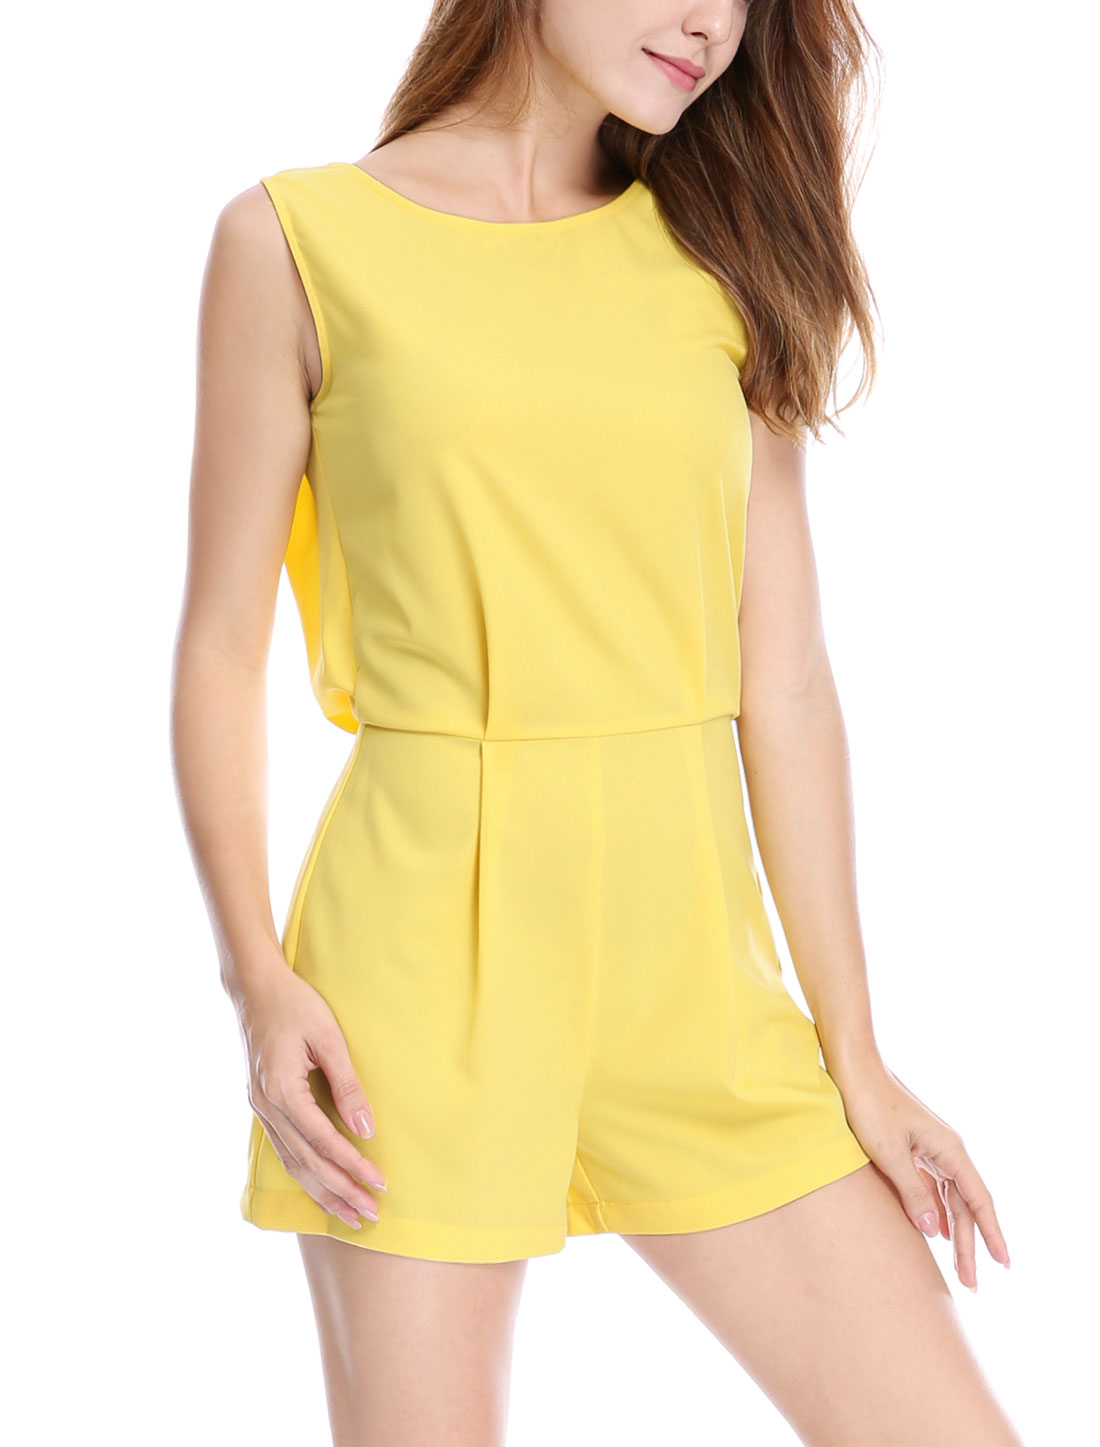 Allegra K Women Sleeveless Crew Neck Lace Insert Back Romper Yellow M